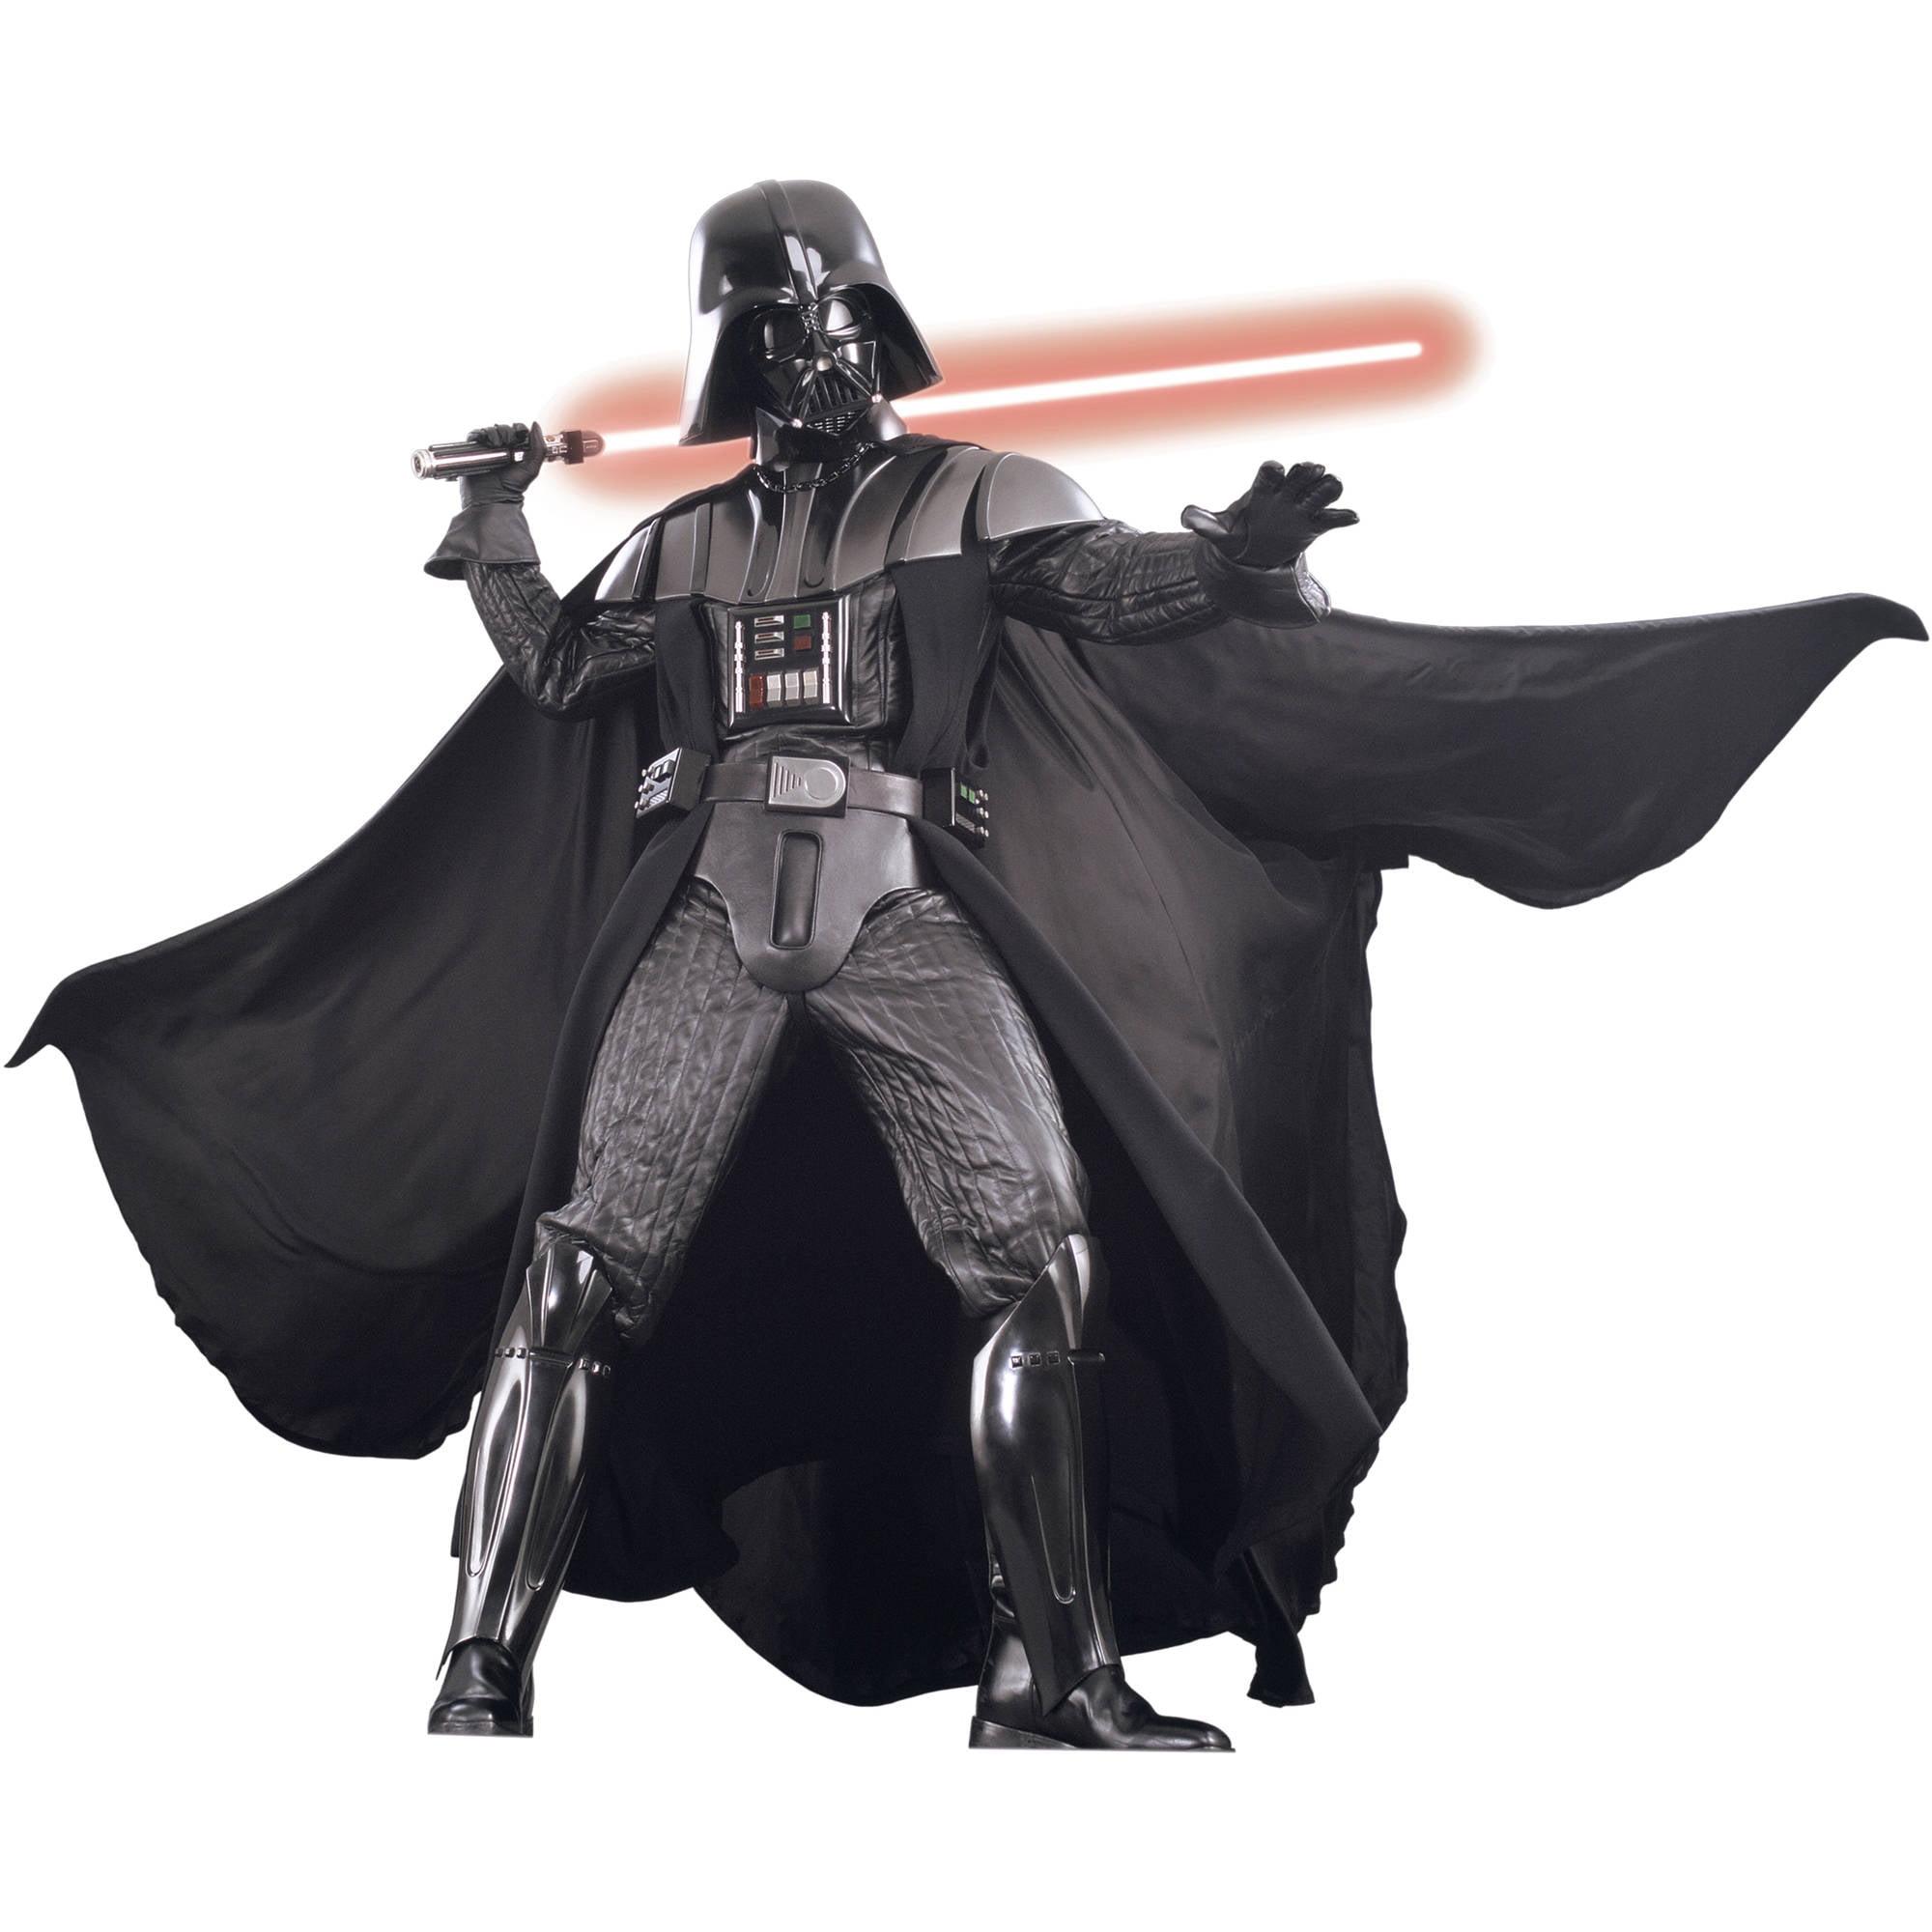 Star Wars Darth Vader Supreme Adult Halloween Costume